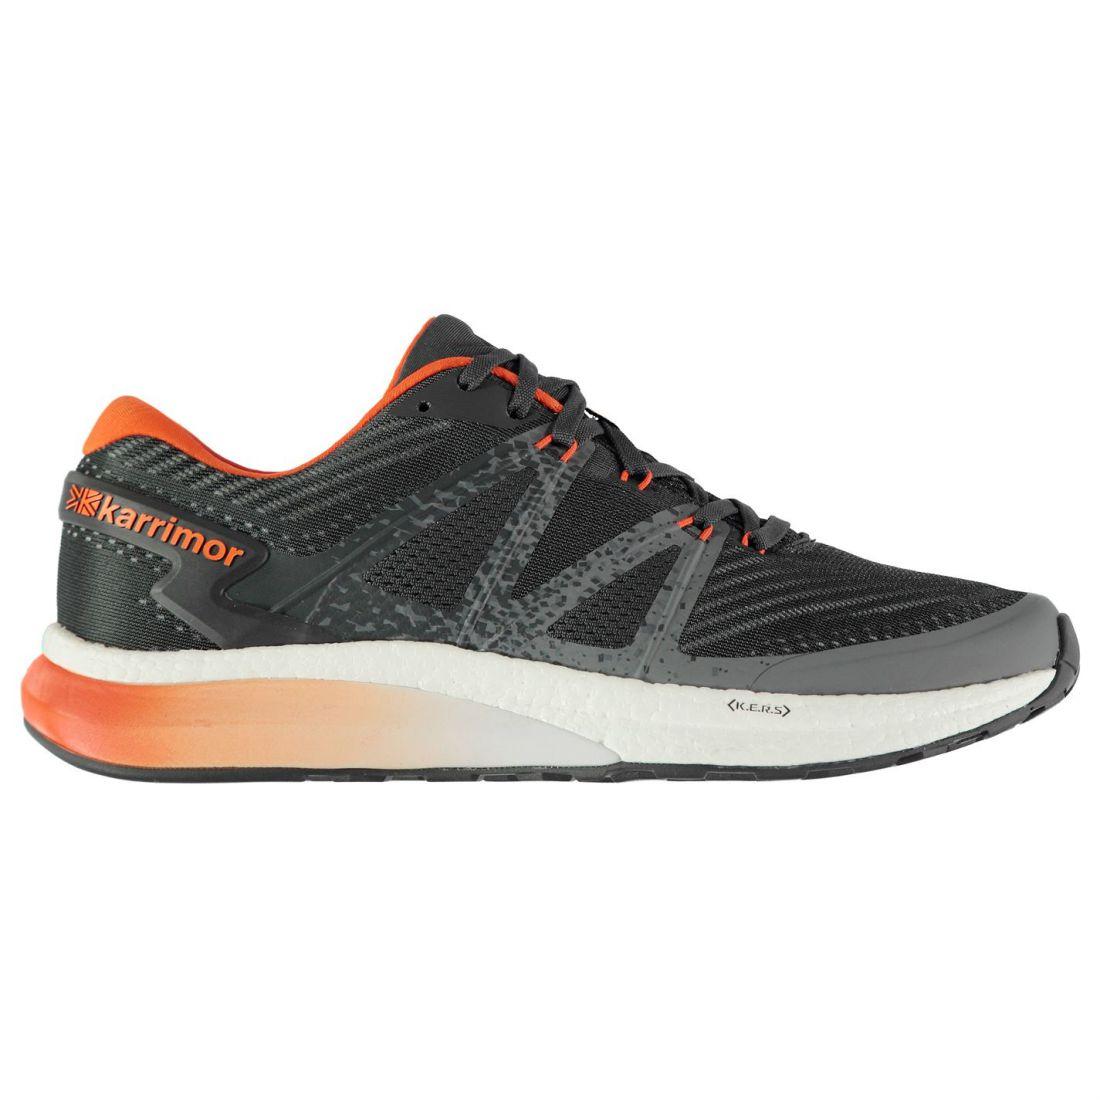 Karrimor Excel 3 Sup Mens Gents Road Running shoes